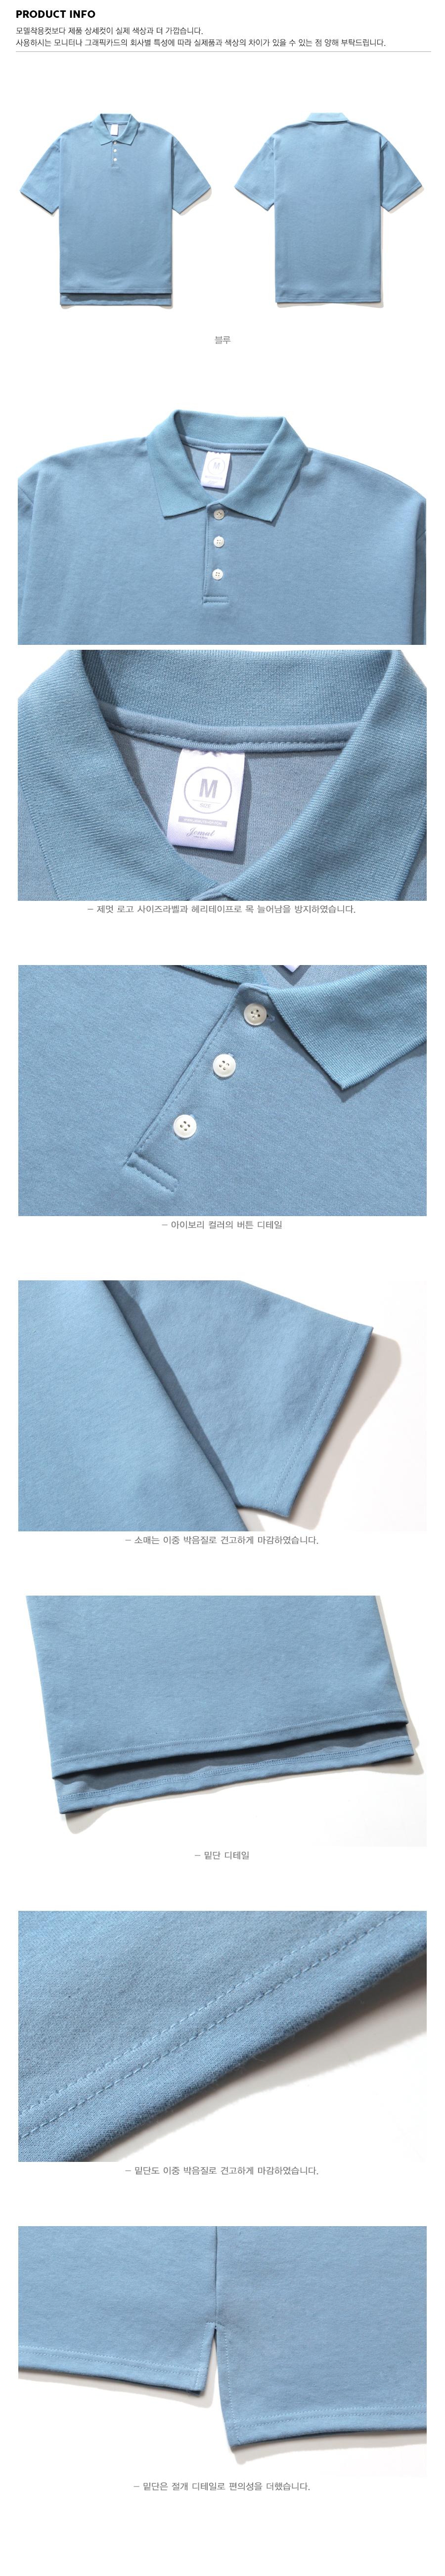 20180420_loosefit_collar_detail_blue_kj.jpg